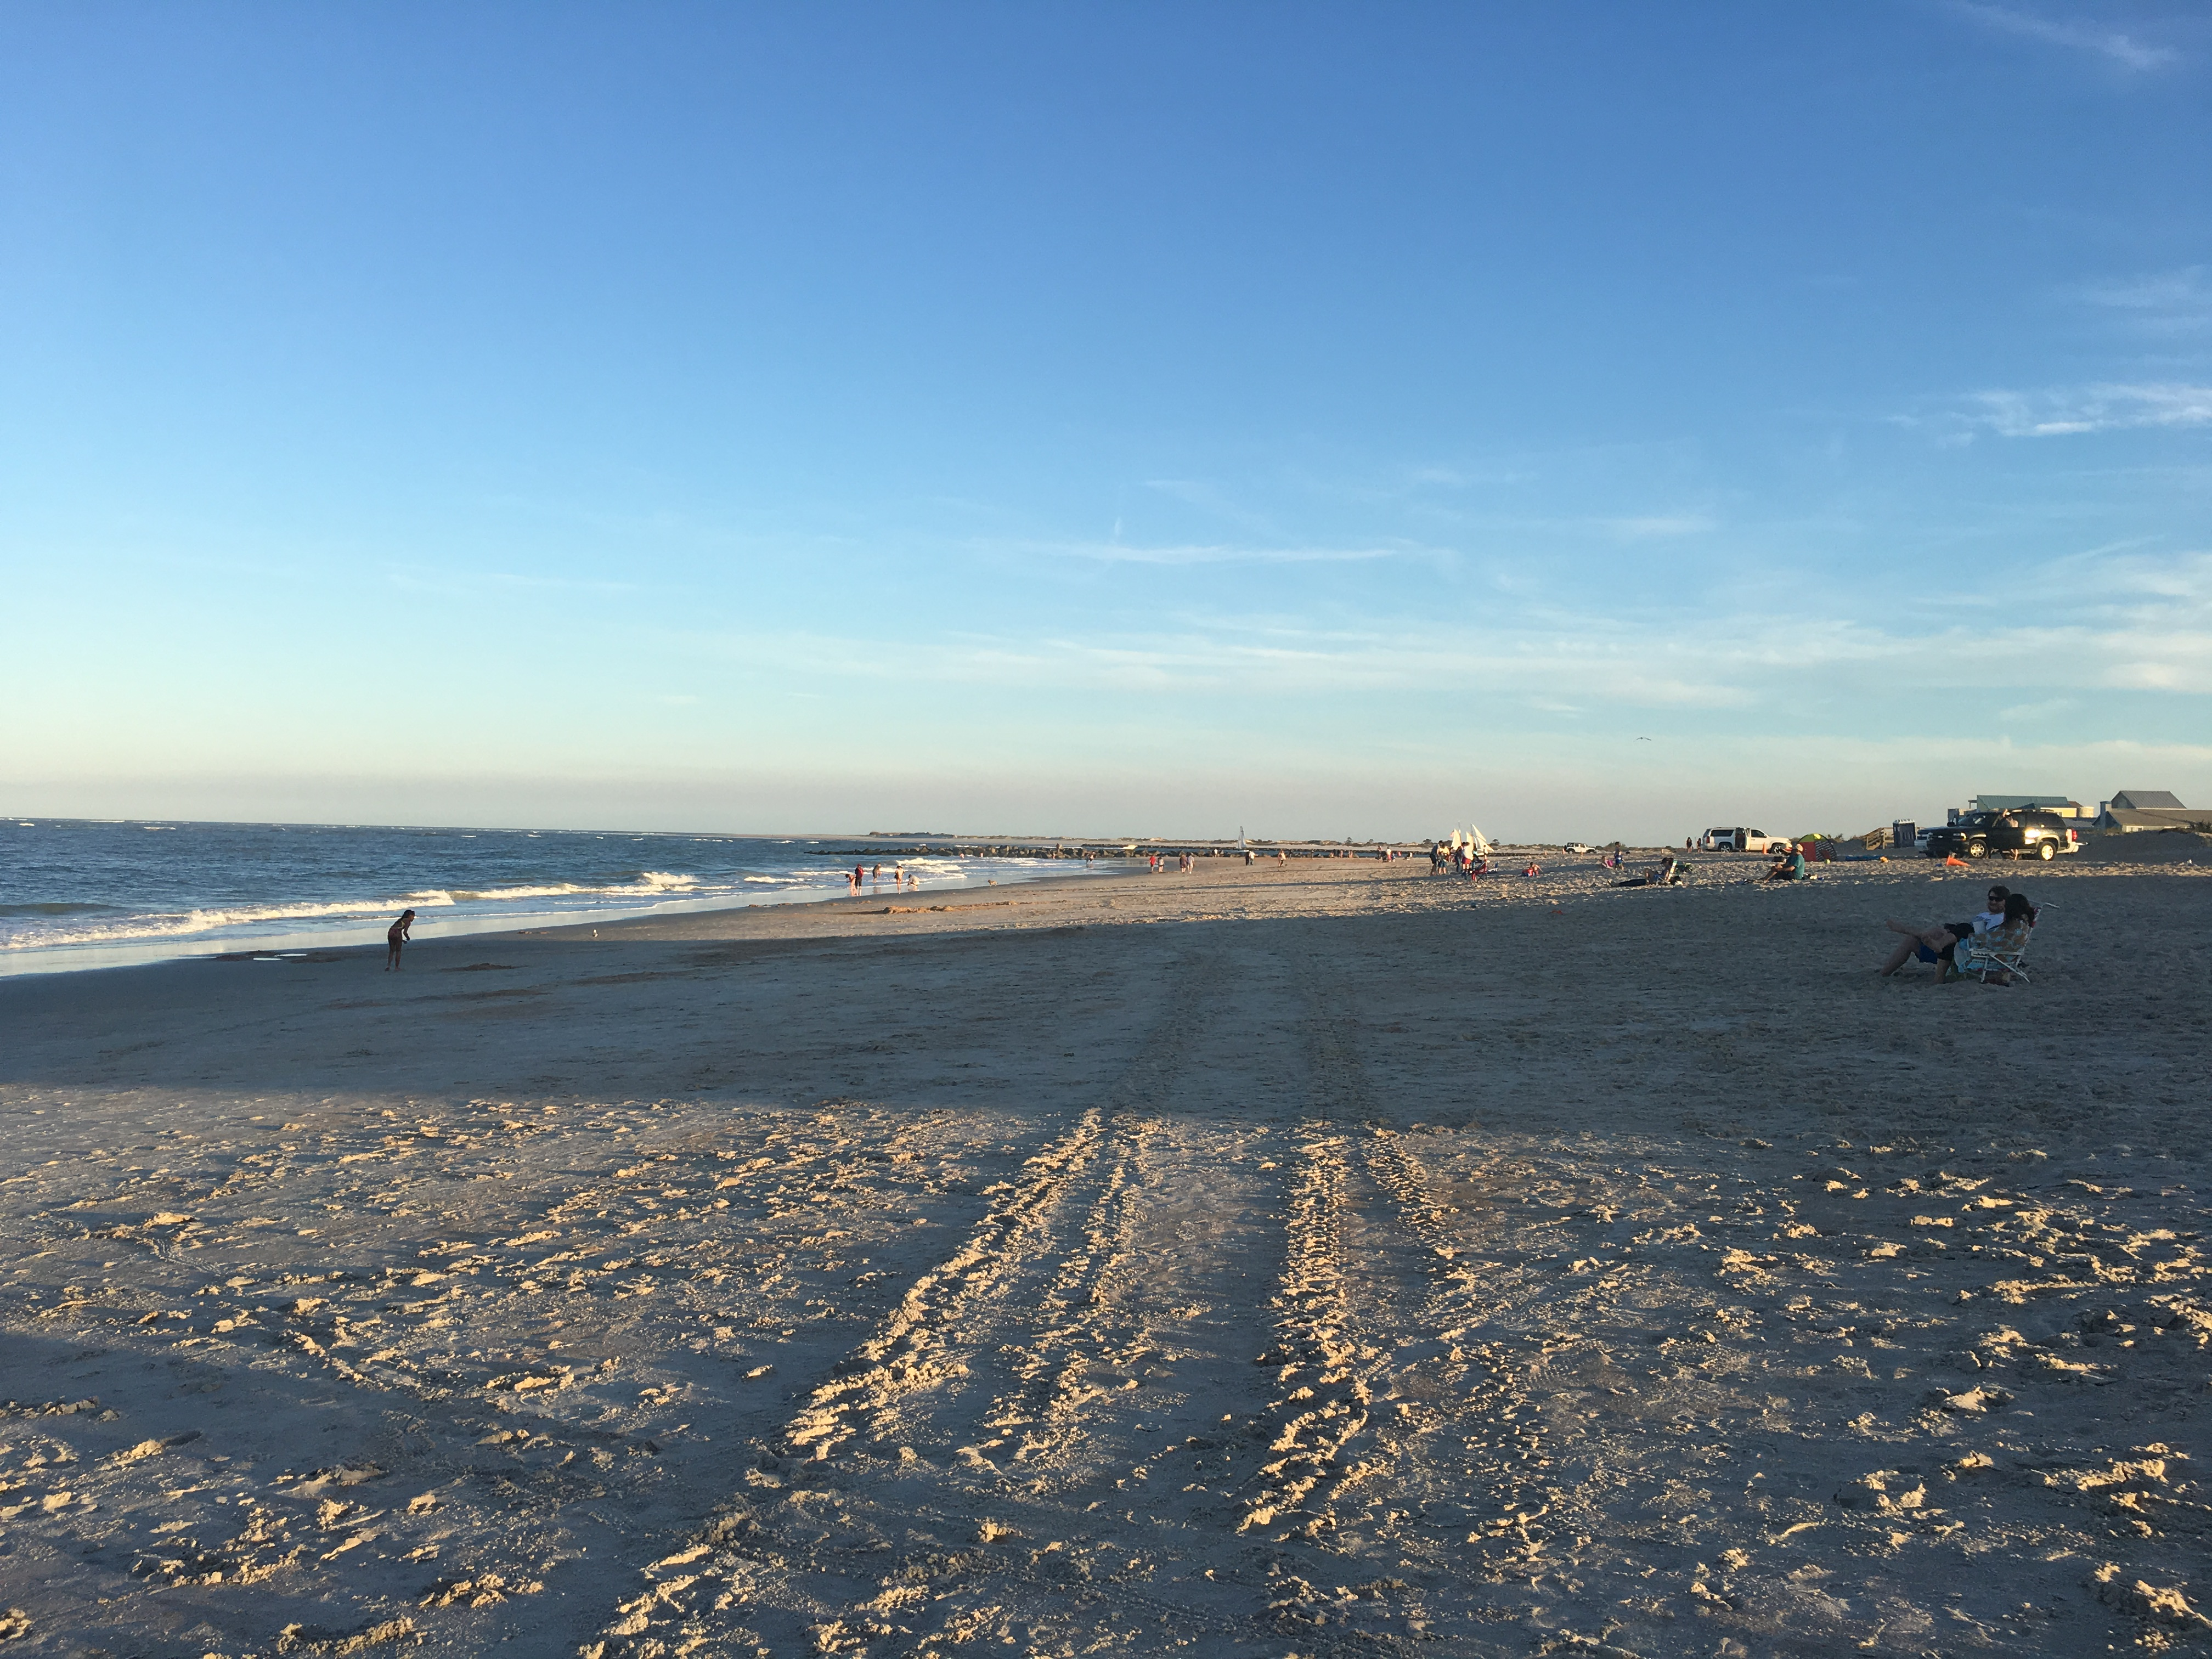 St Johns County Vehicle Beach Access